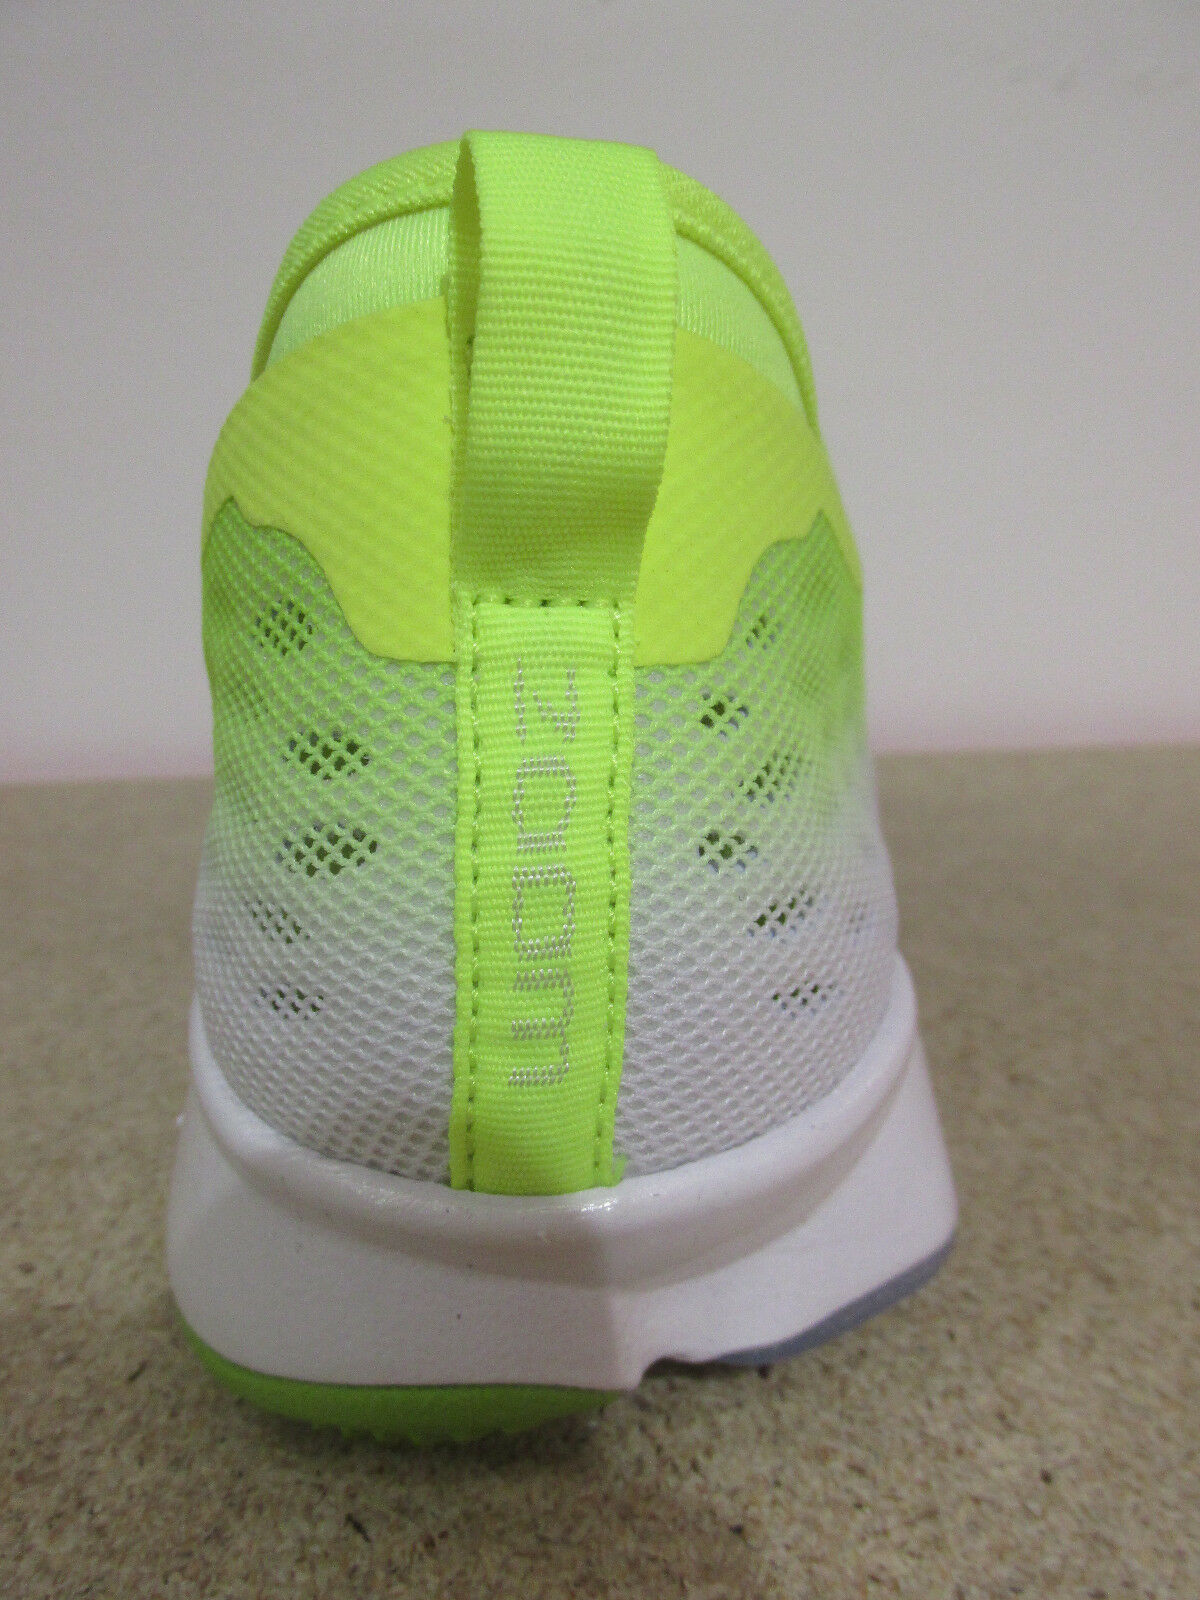 Nike Damen 684984 Zoom Passform Beweglichkeit Laufschuhe 684984 Damen 701 Turnschuhe 5d4486